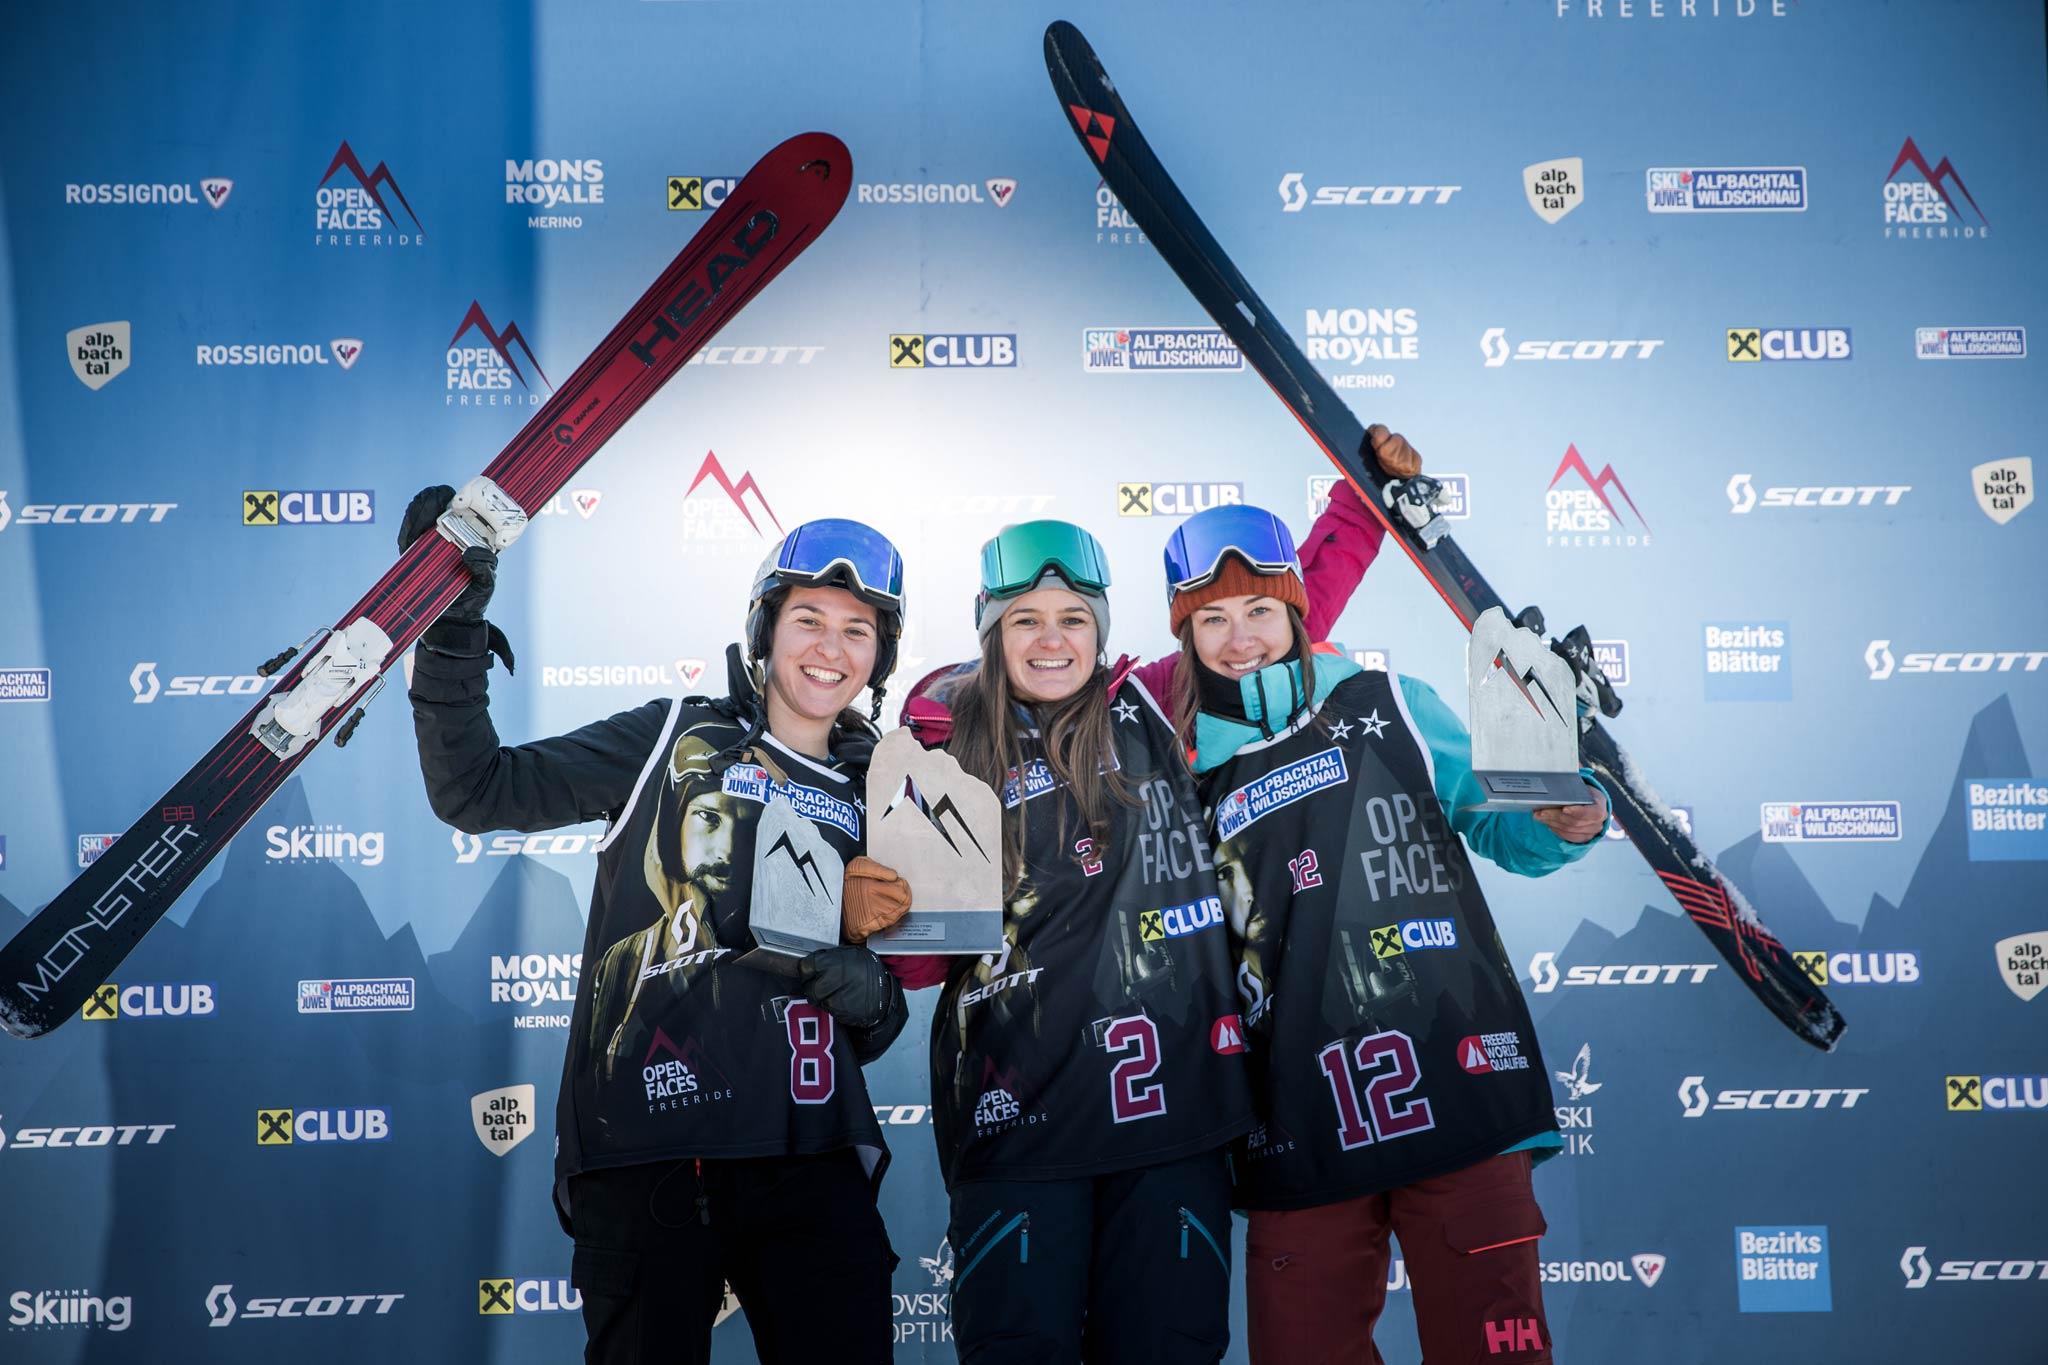 Die drei besten Frauen: Ann-Sophie Herbst(AUT), Lisa-Maria Ulz (AUT), Maria Pfeifer (ITA) - Foto: Mia Knoll